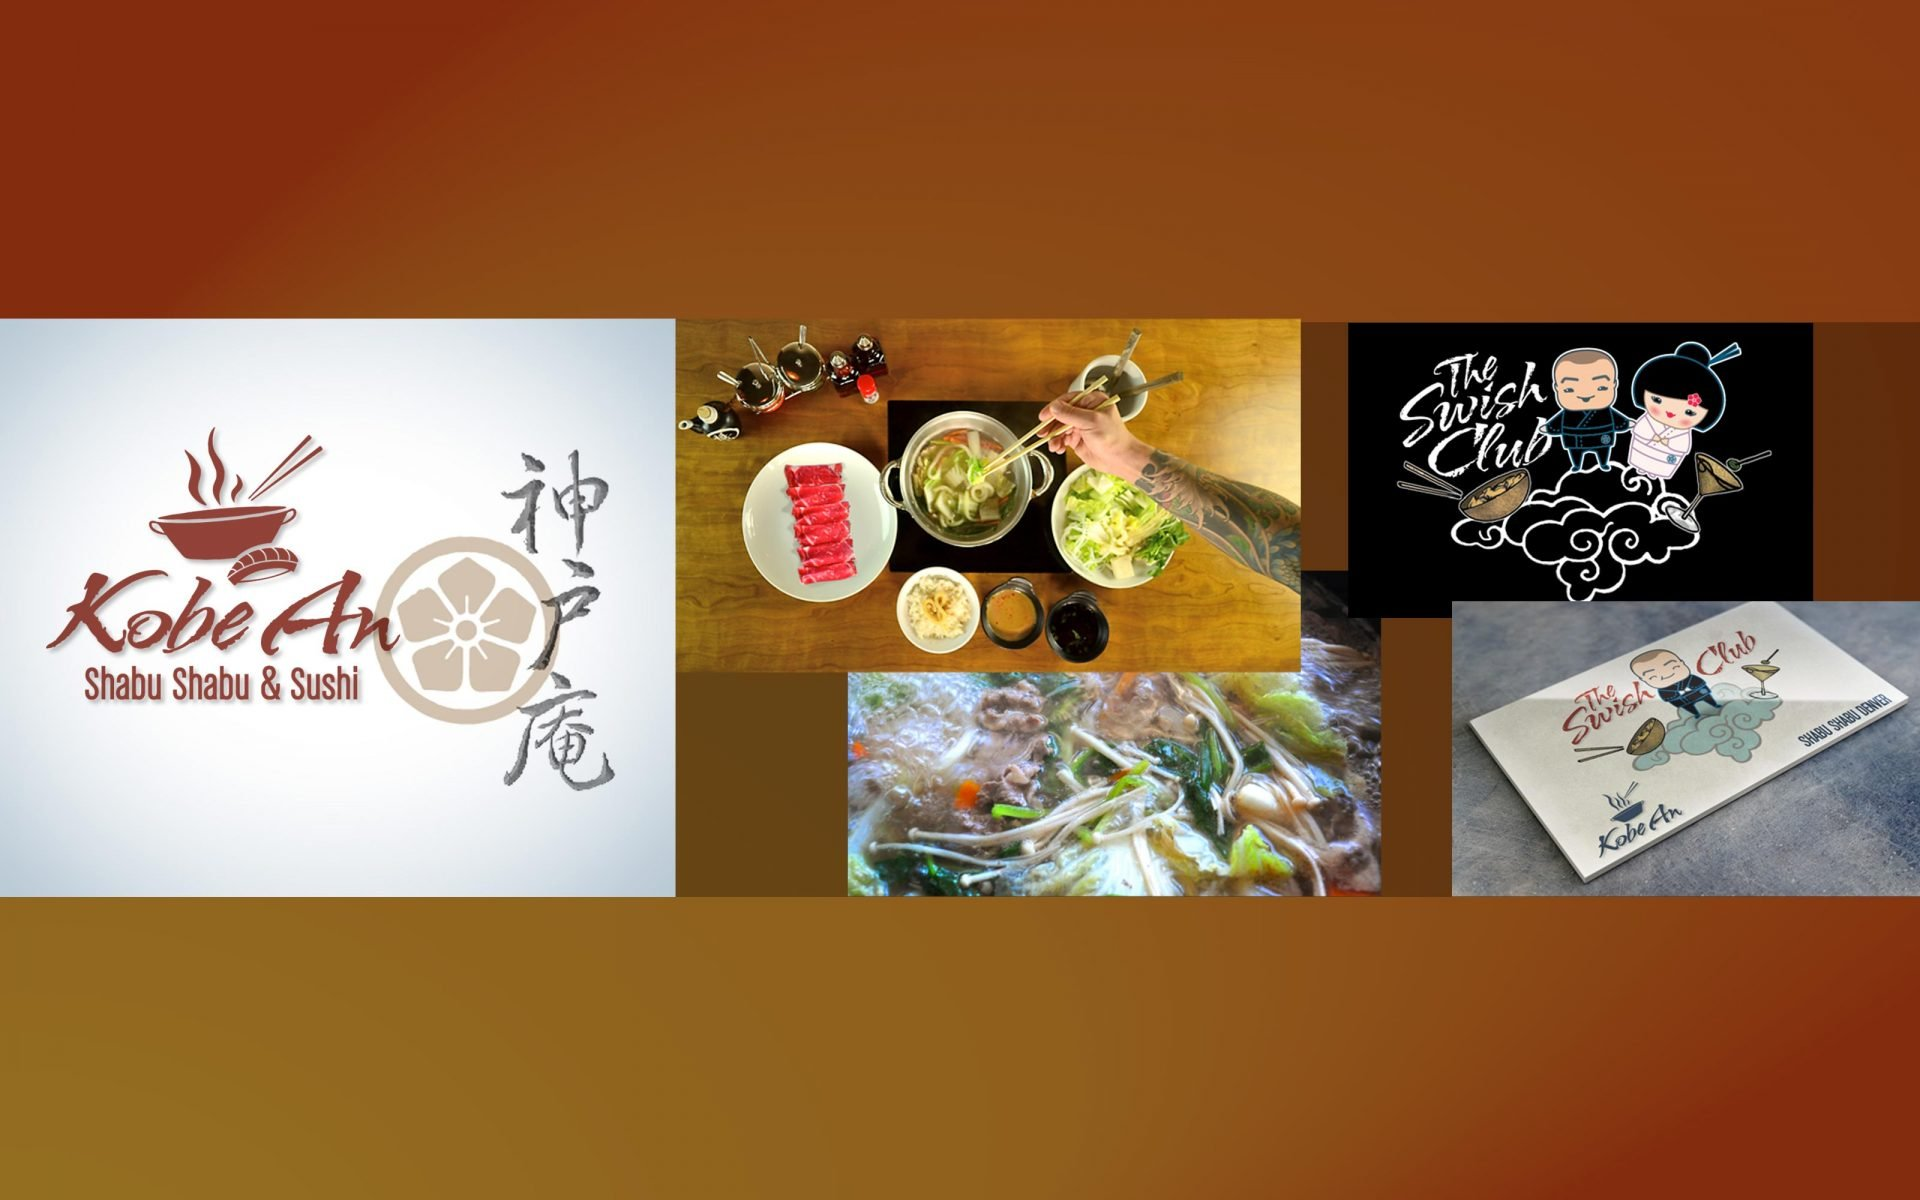 Kobe An Japanese Grill